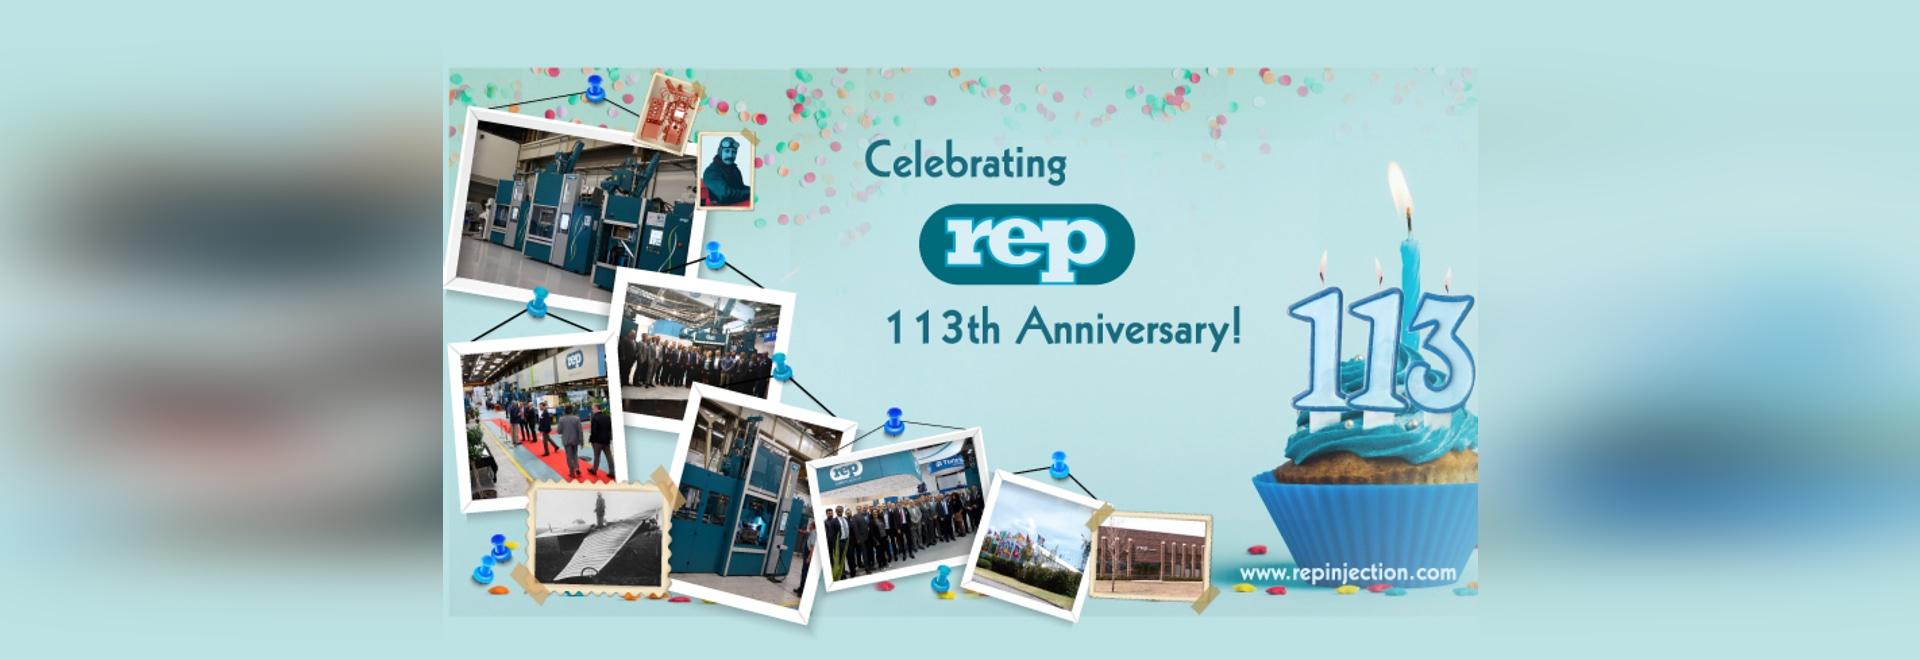 Celebrating REP 113th Anniversary!